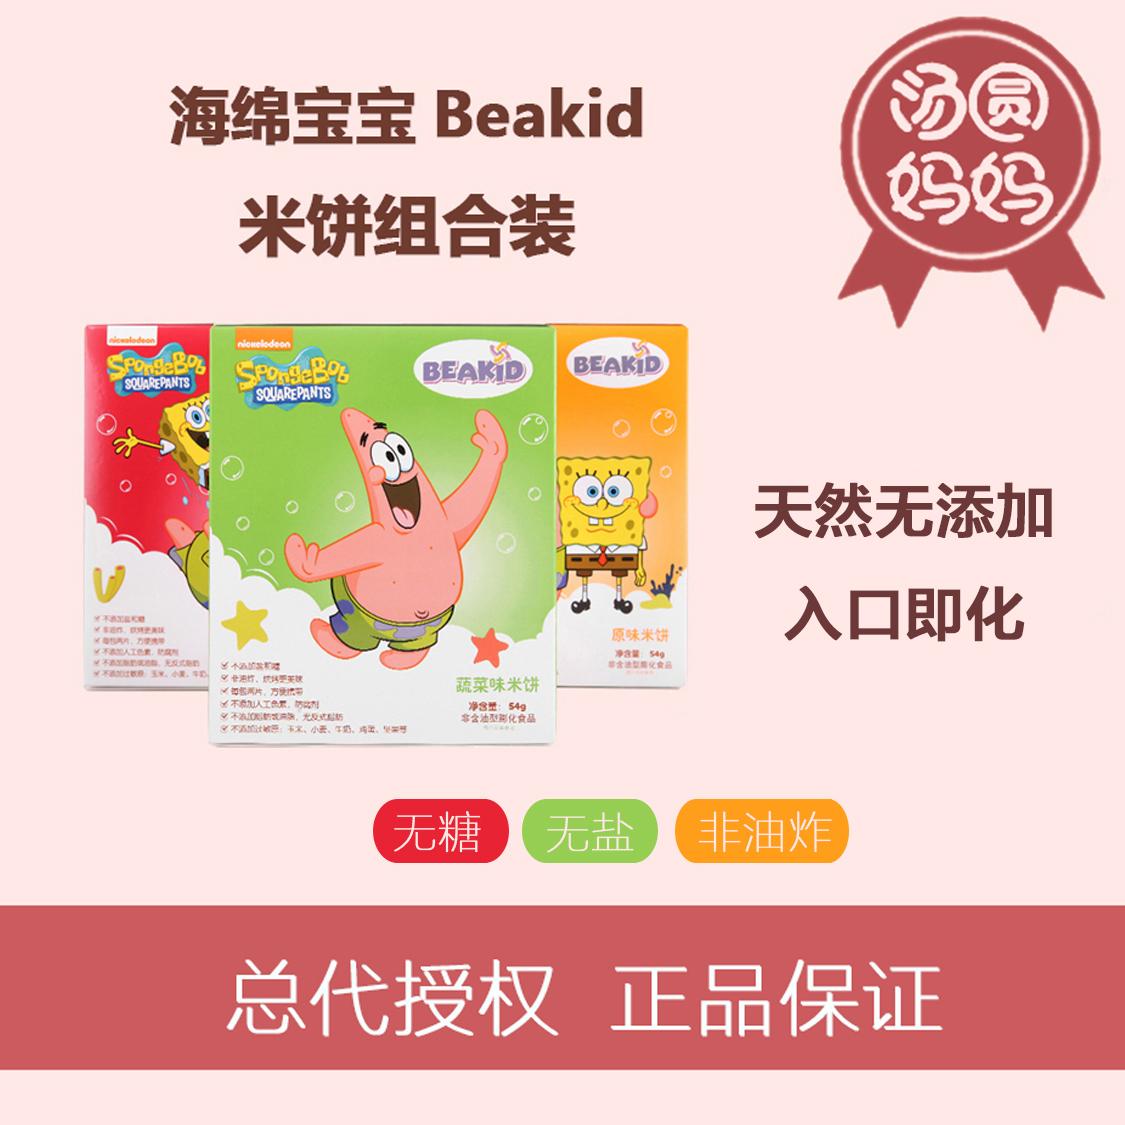 Beakid海绵宝宝米饼婴儿童磨牙棒饼干幼儿零食辅食6个月 54g*3盒